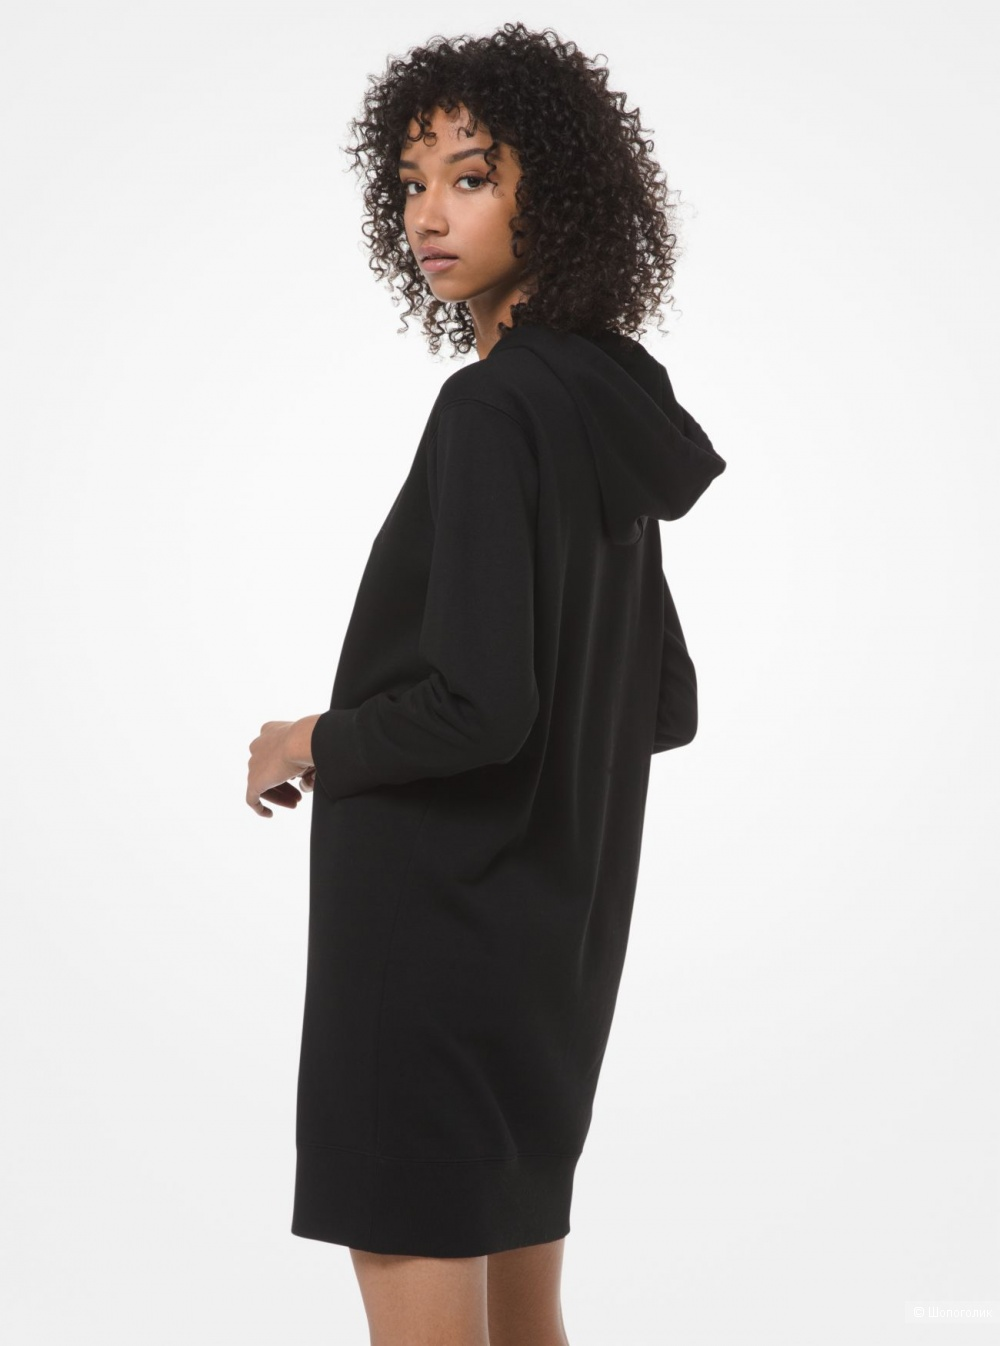 Платье-худи Michael Kors, размер М